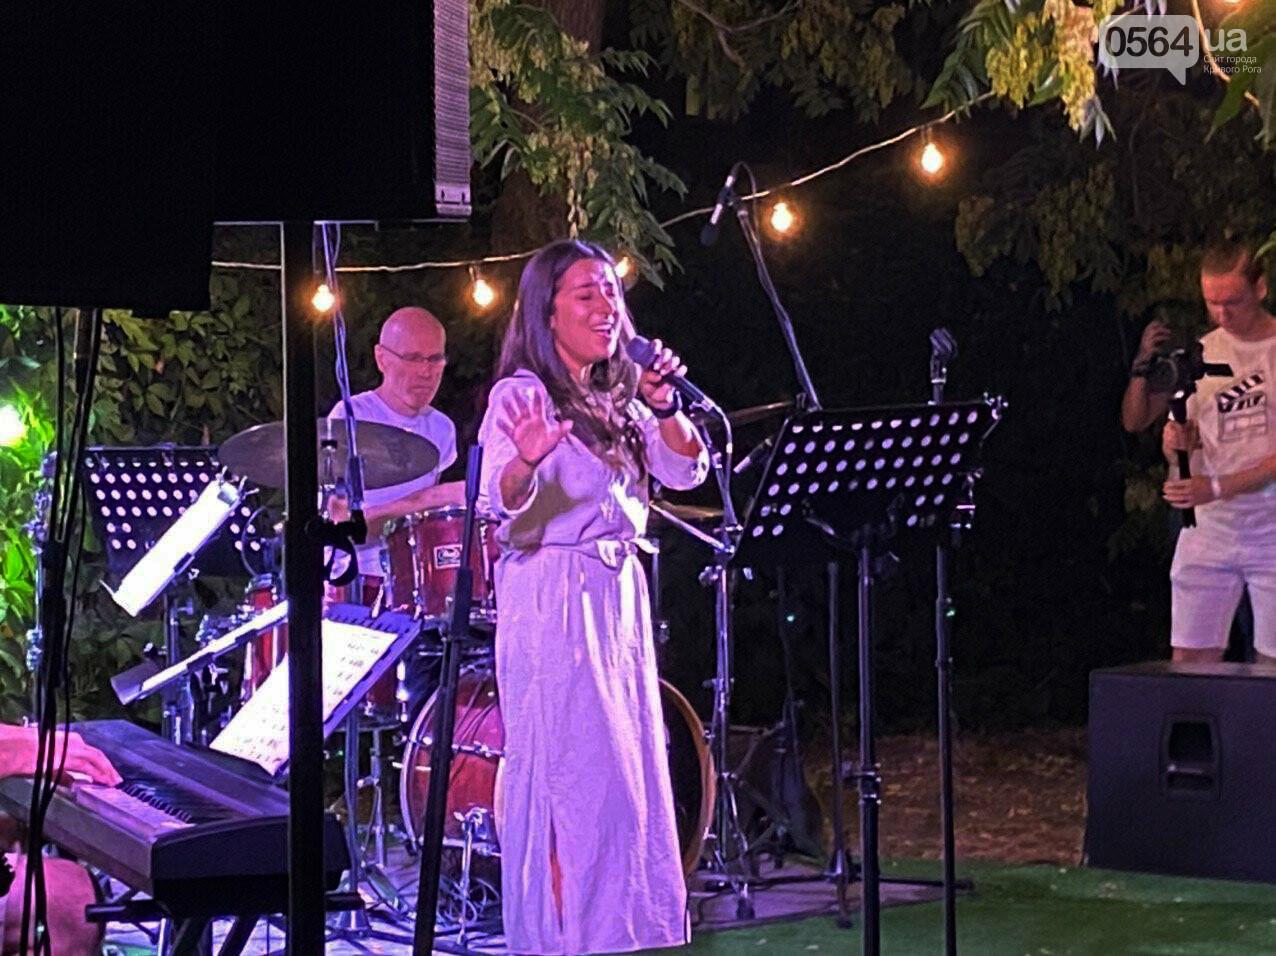 Под звездным небом криворожане наслаждались летним джазом от  Advantage Project, - ФОТО, ВИДЕО , фото-61